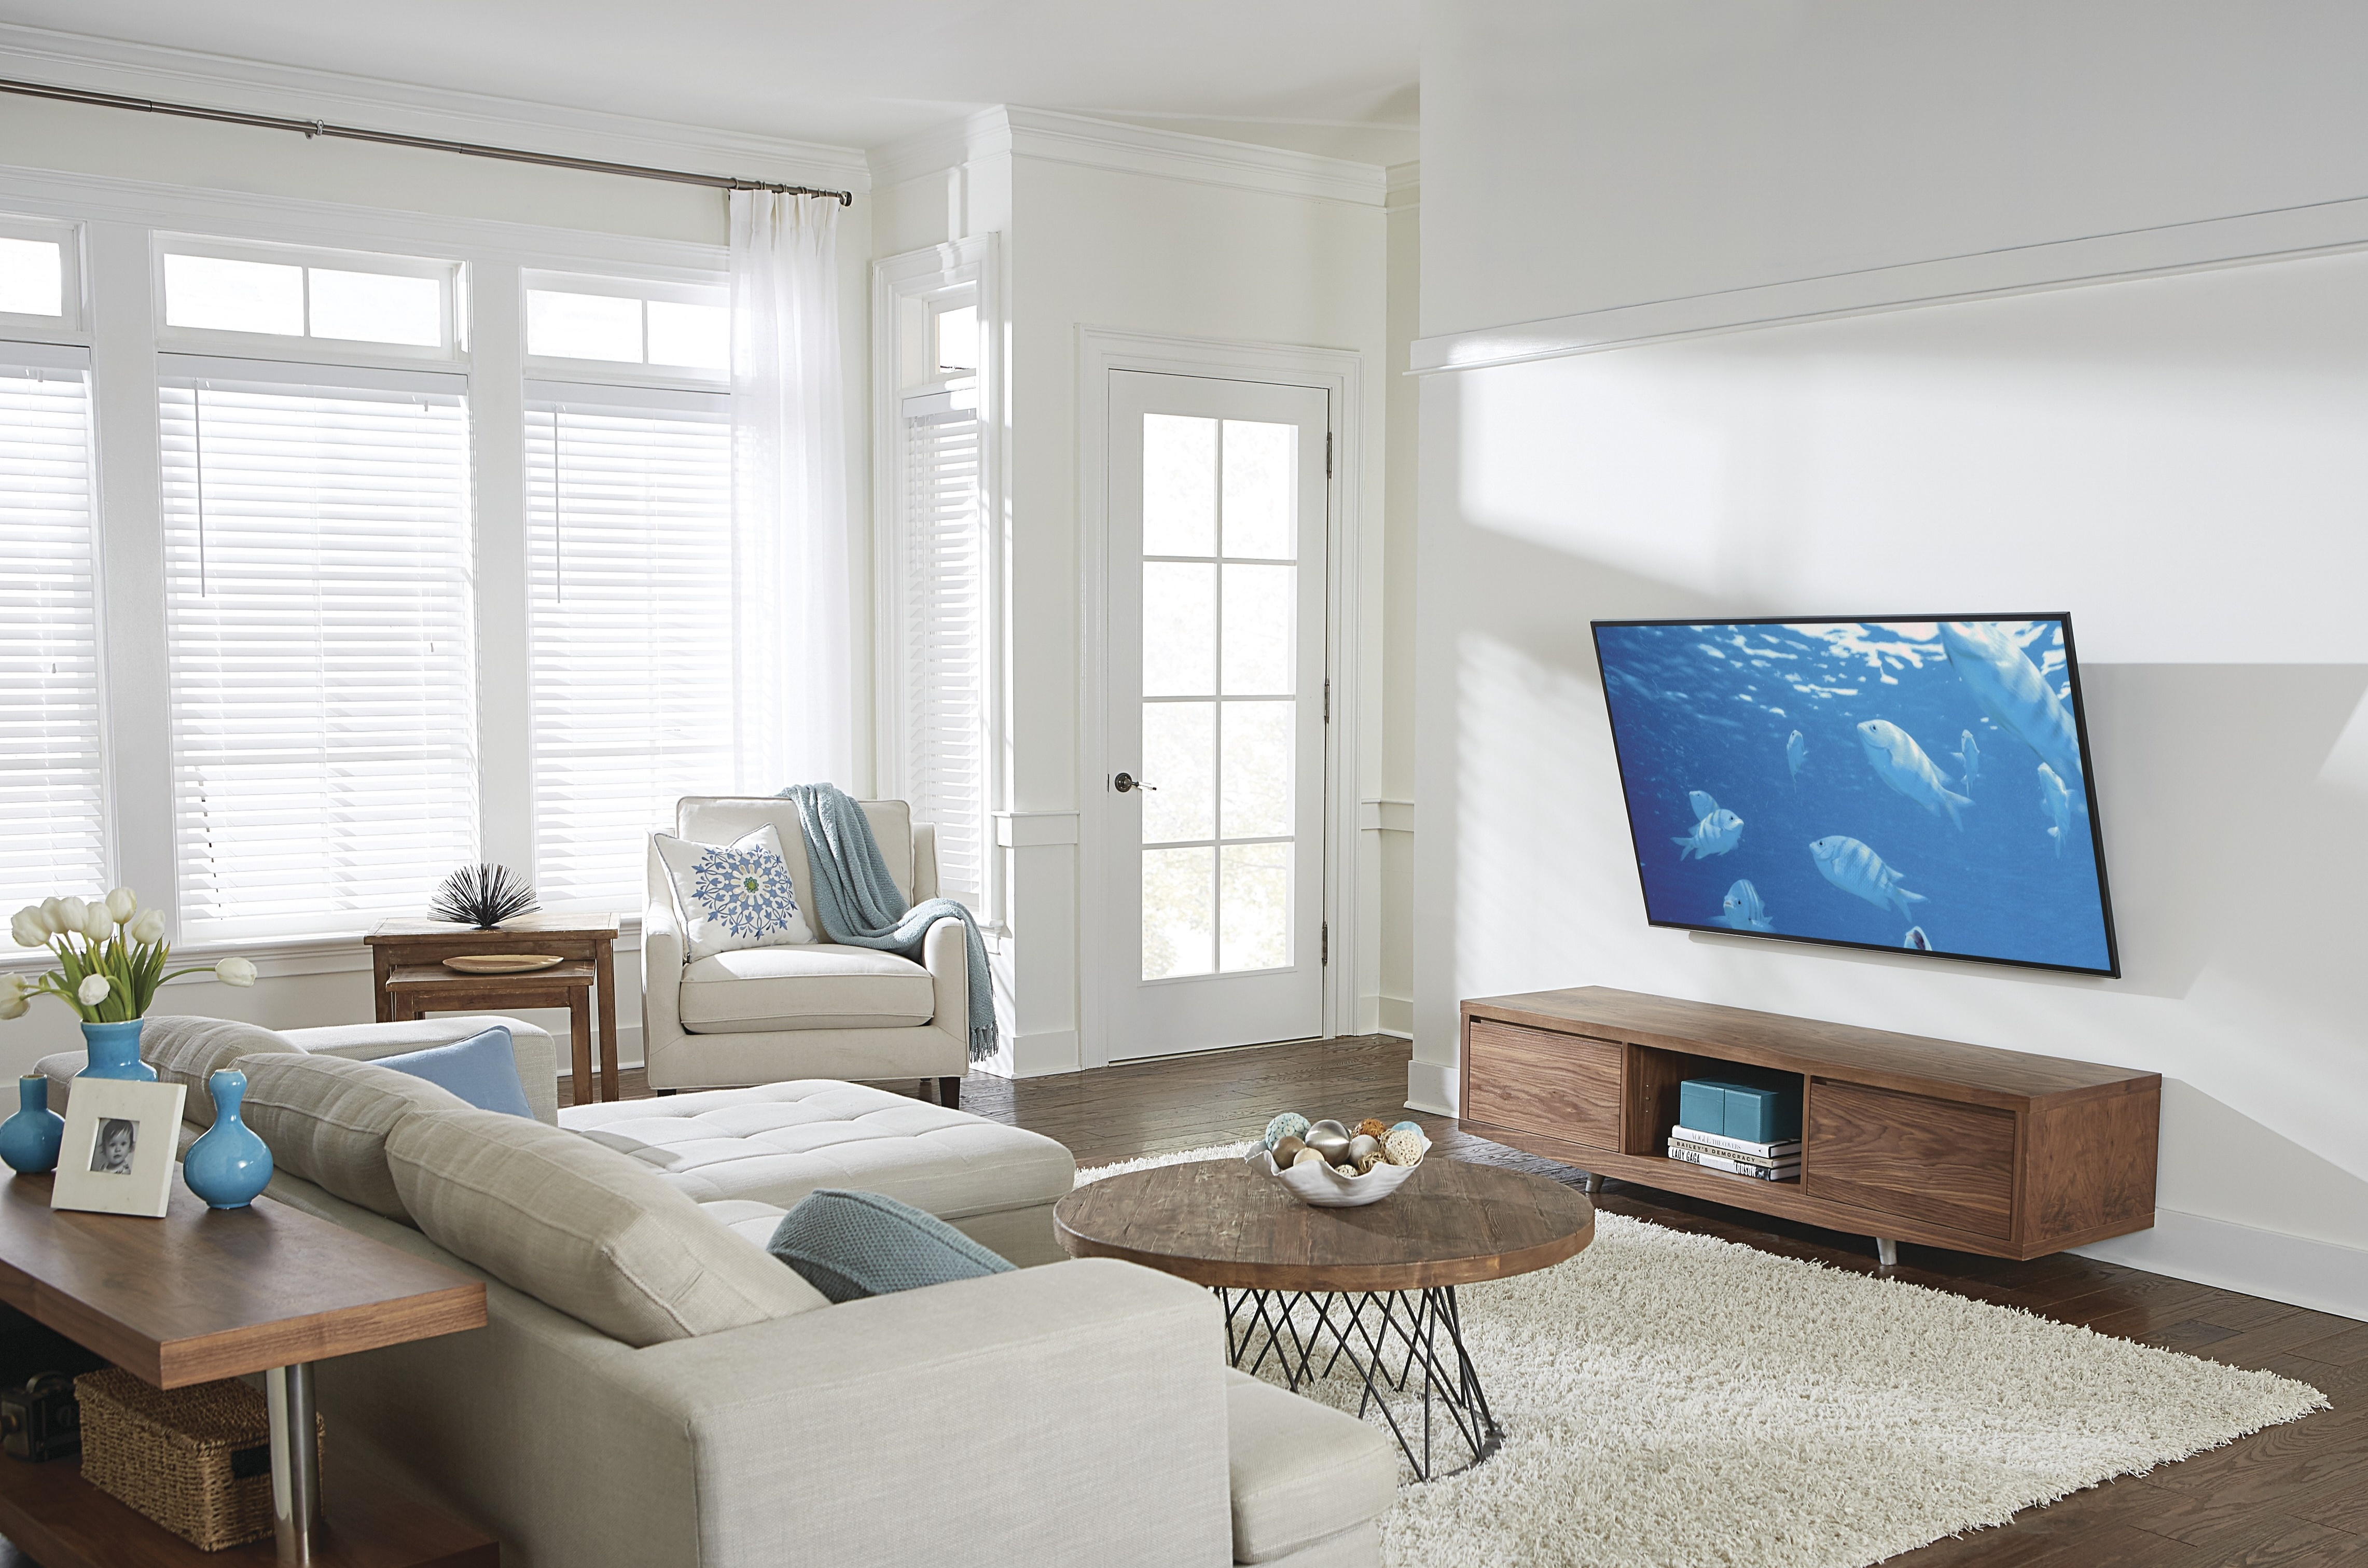 optimal distance from tv to sofa. Black Bedroom Furniture Sets. Home Design Ideas